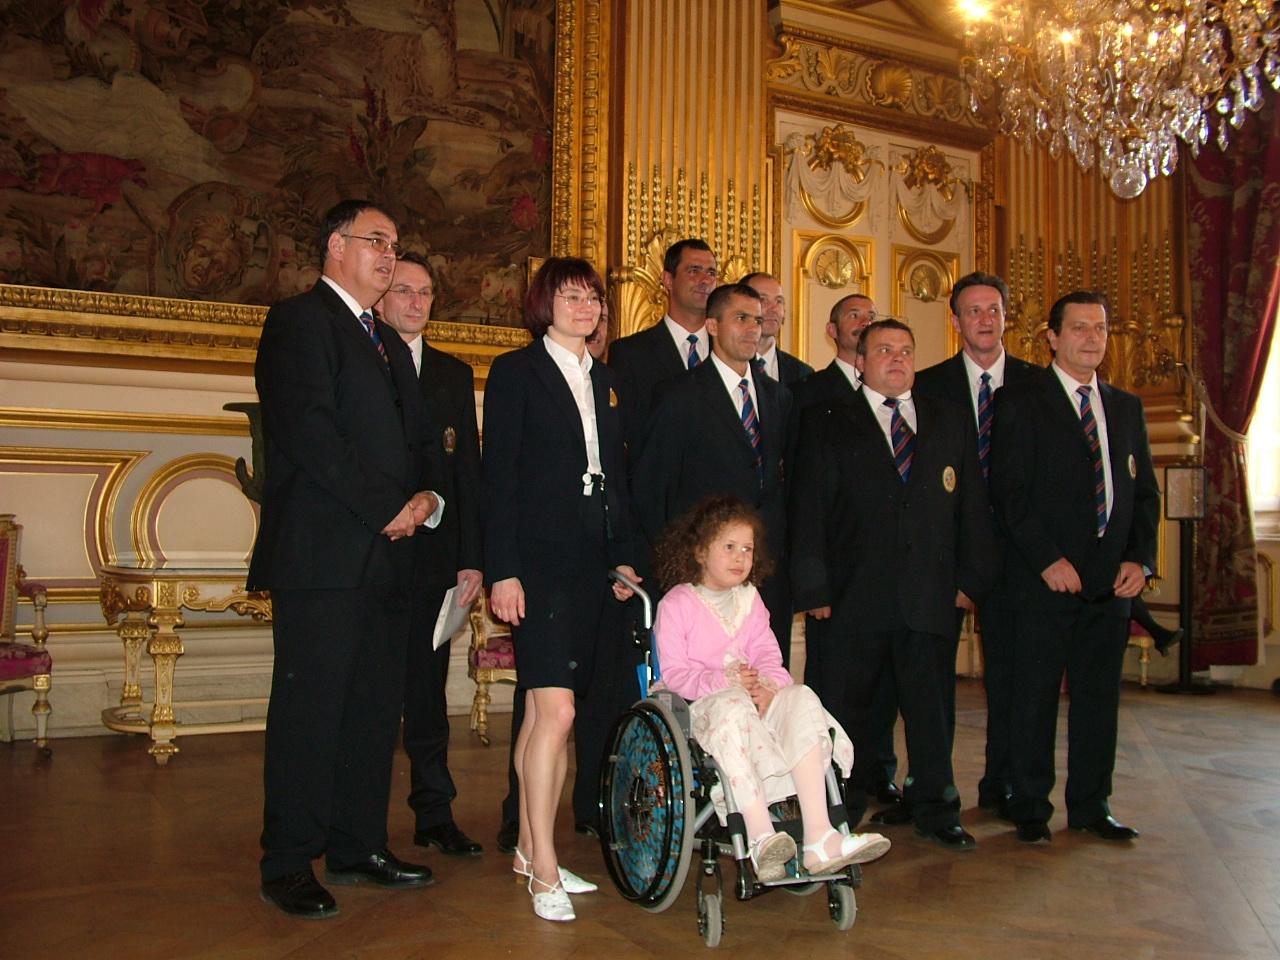 2006 Lyon 2404 167.jpg